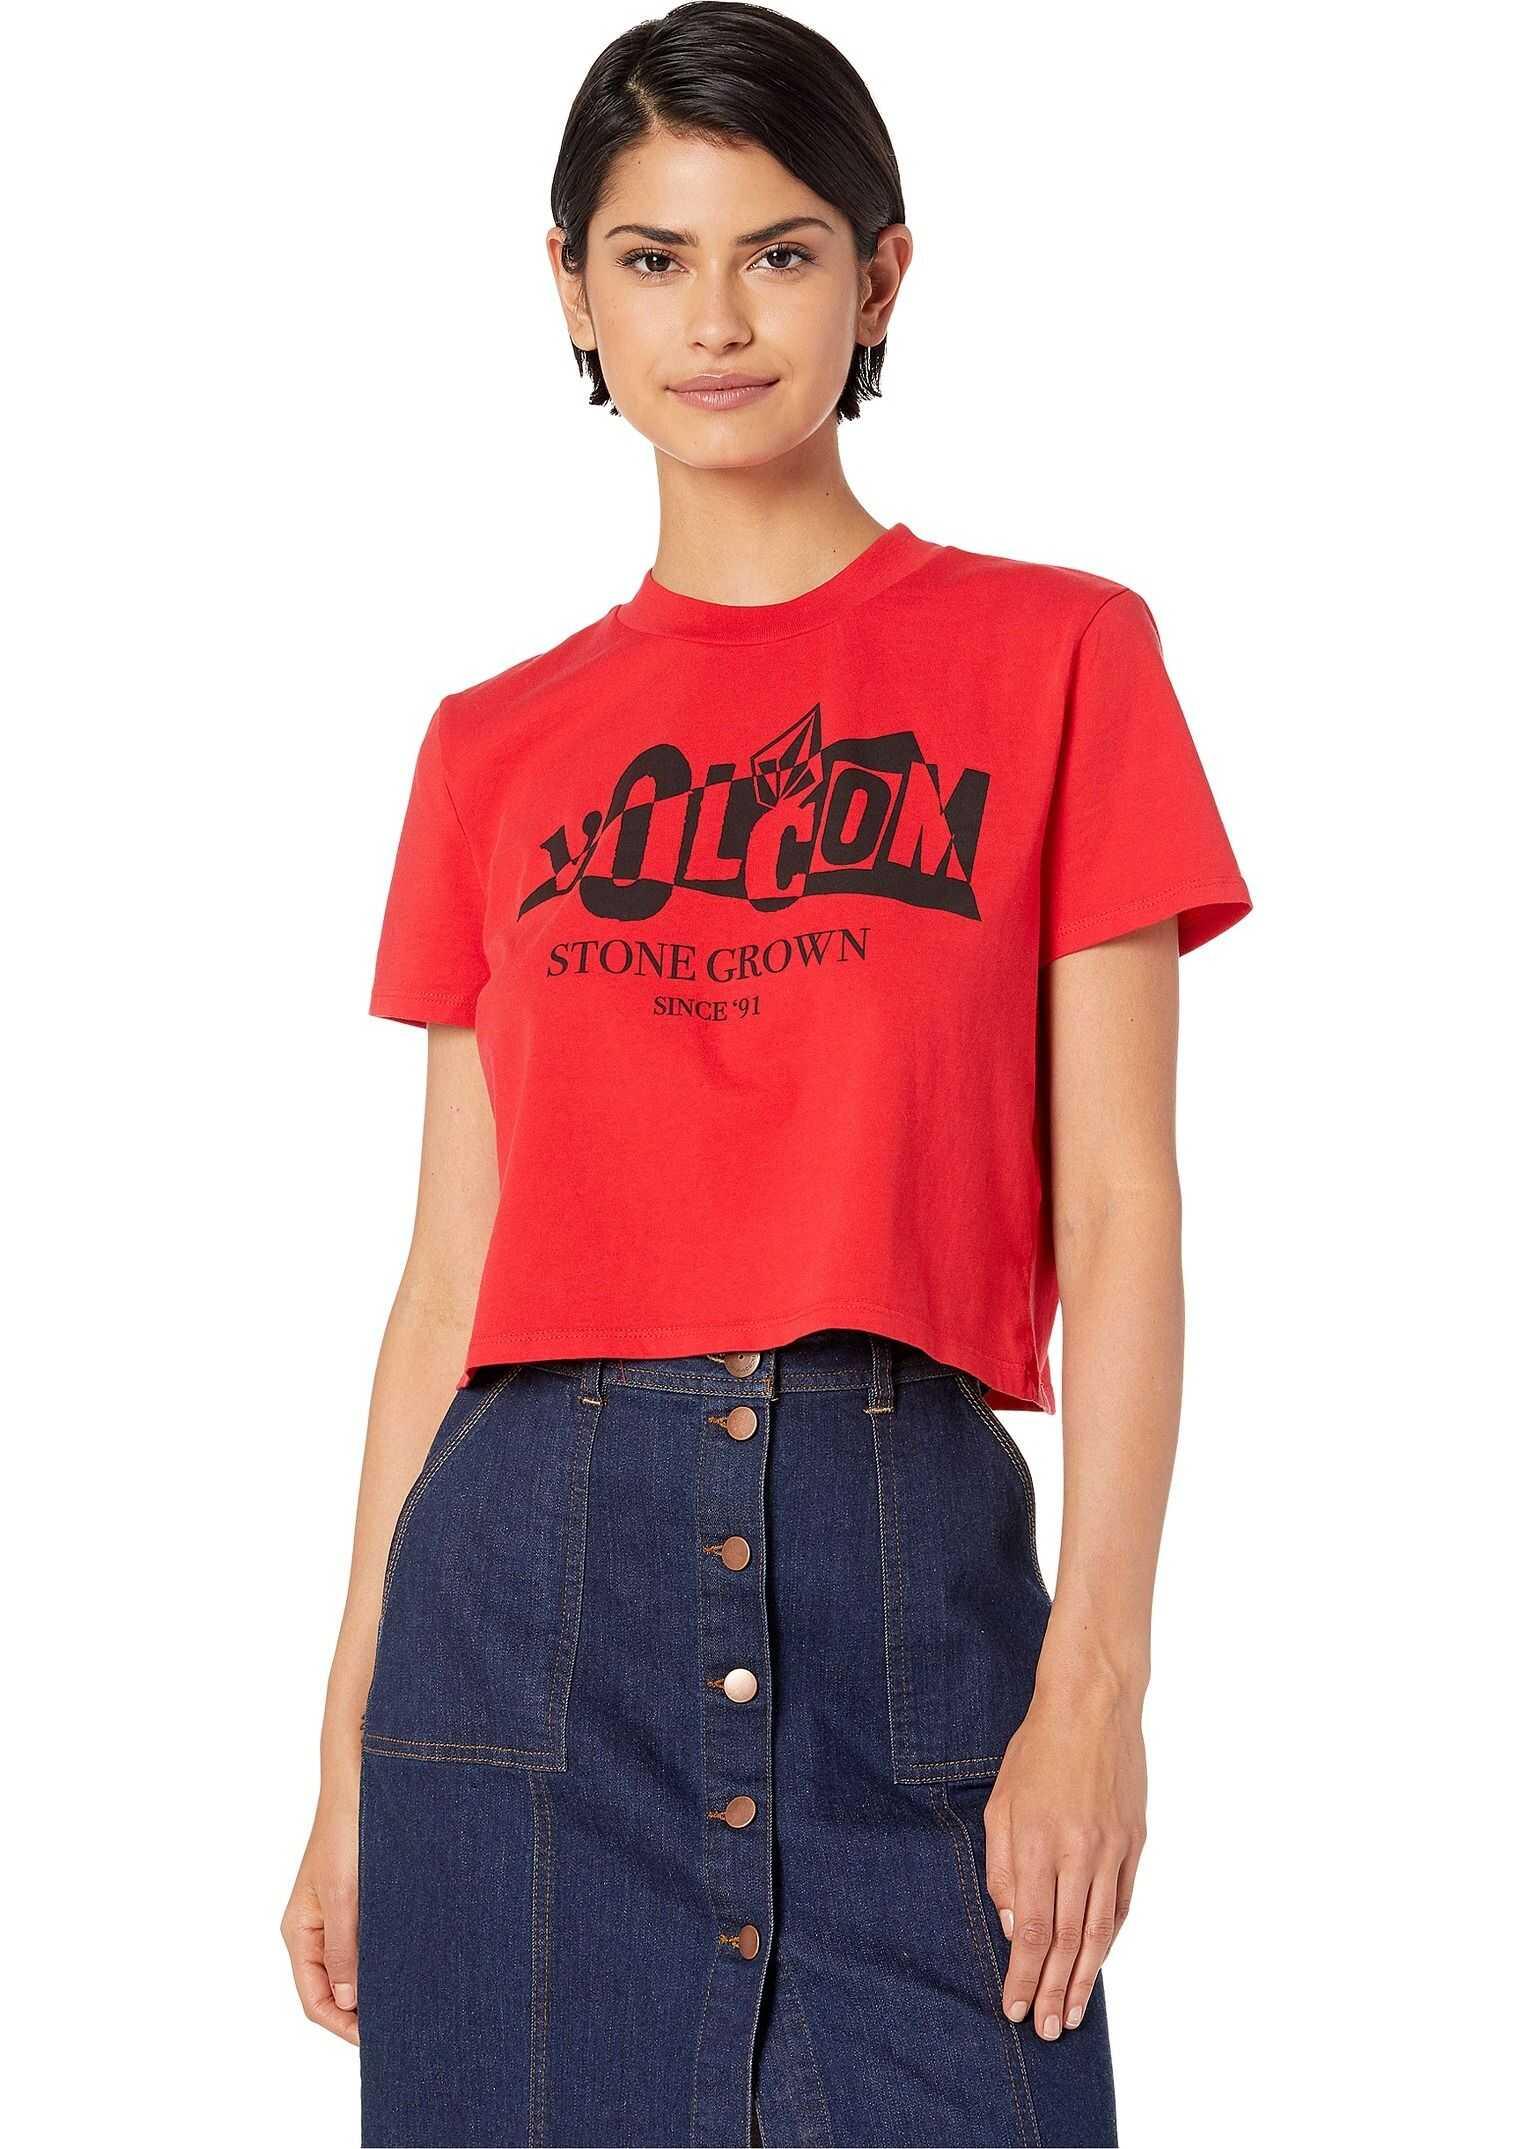 Volcom Stone Grown T-Shirt Red